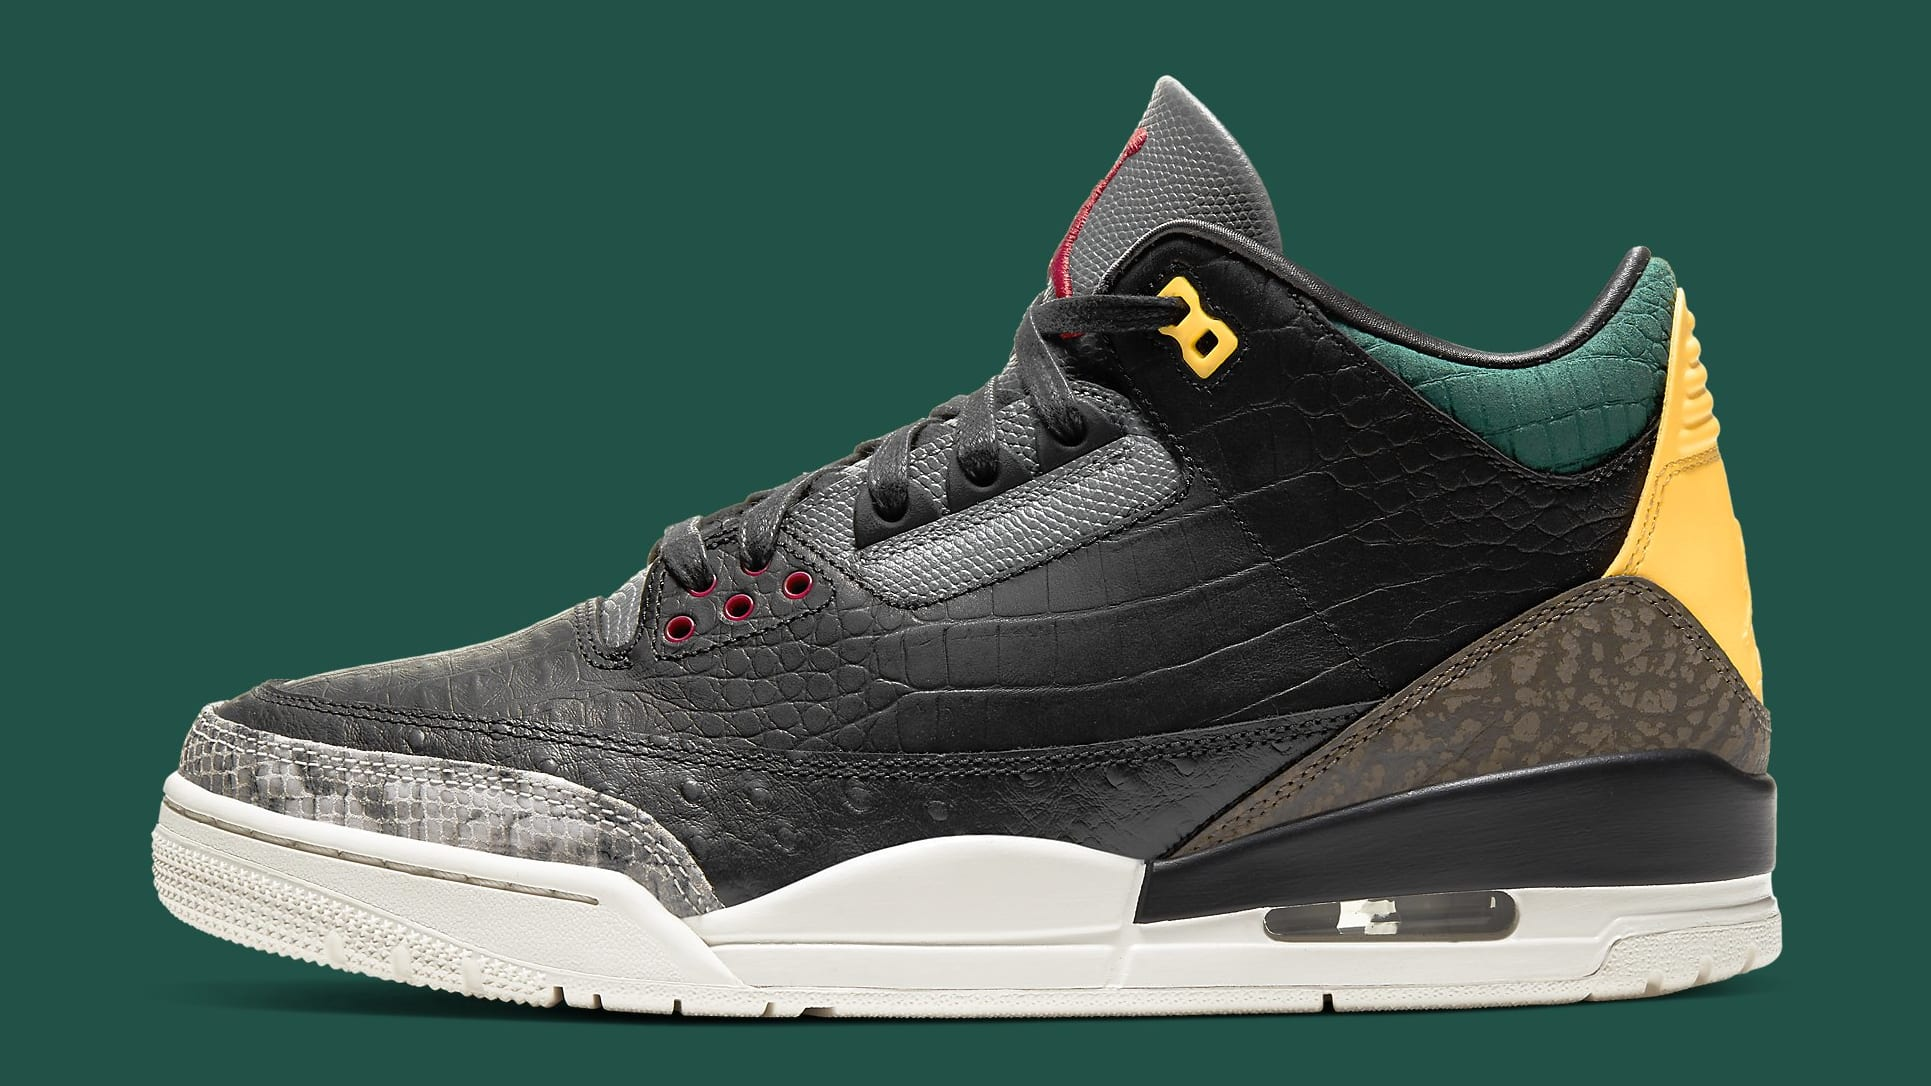 Official Look at the Next 'Animal Instinct' Air Jordan 3